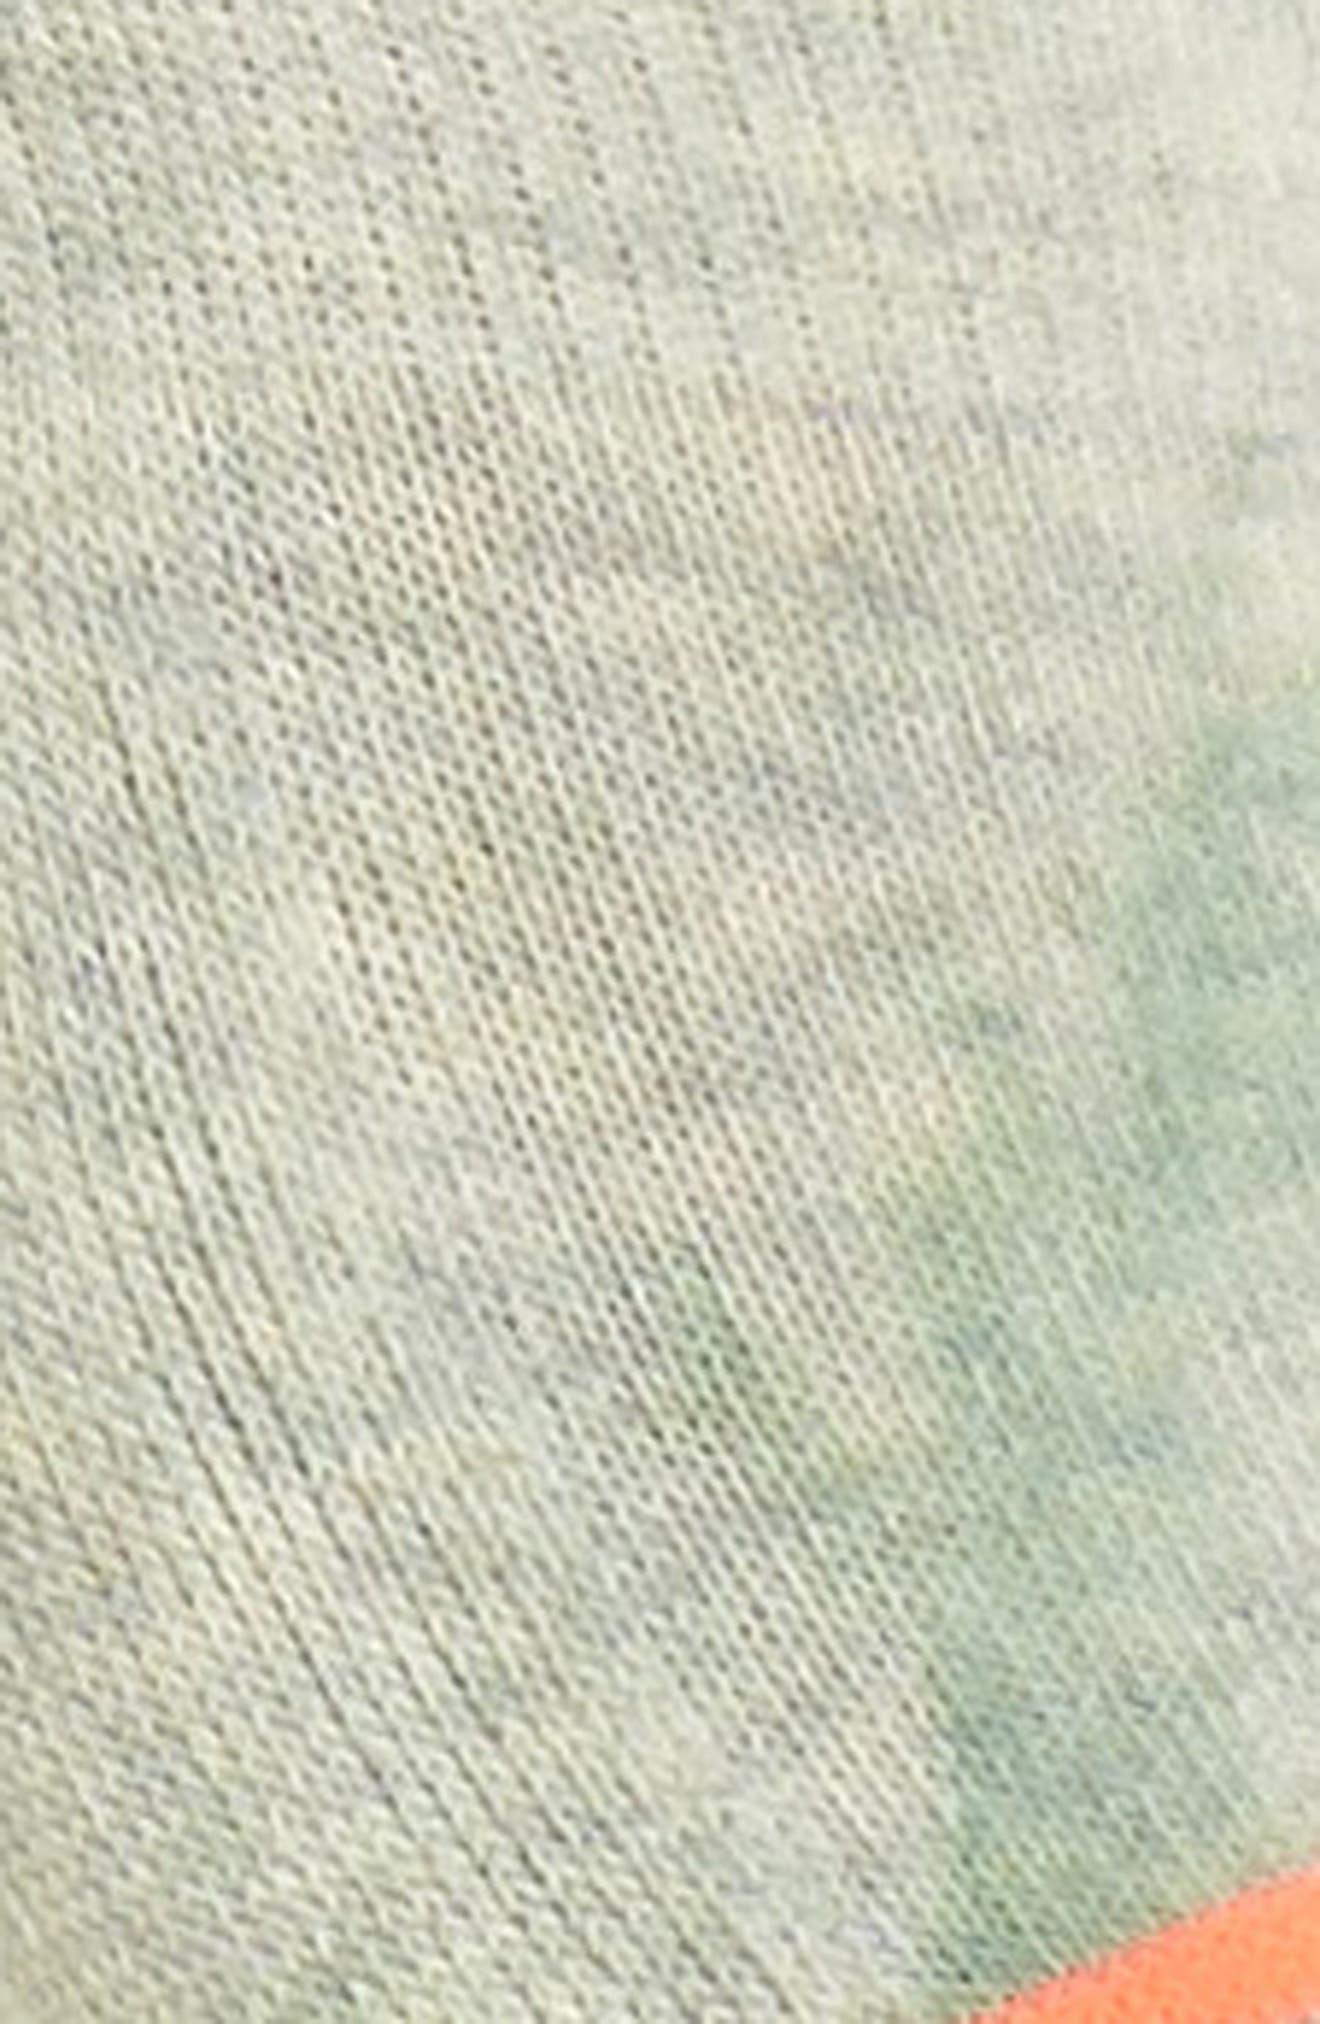 Mint No-Show Socks,                             Alternate thumbnail 2, color,                             440